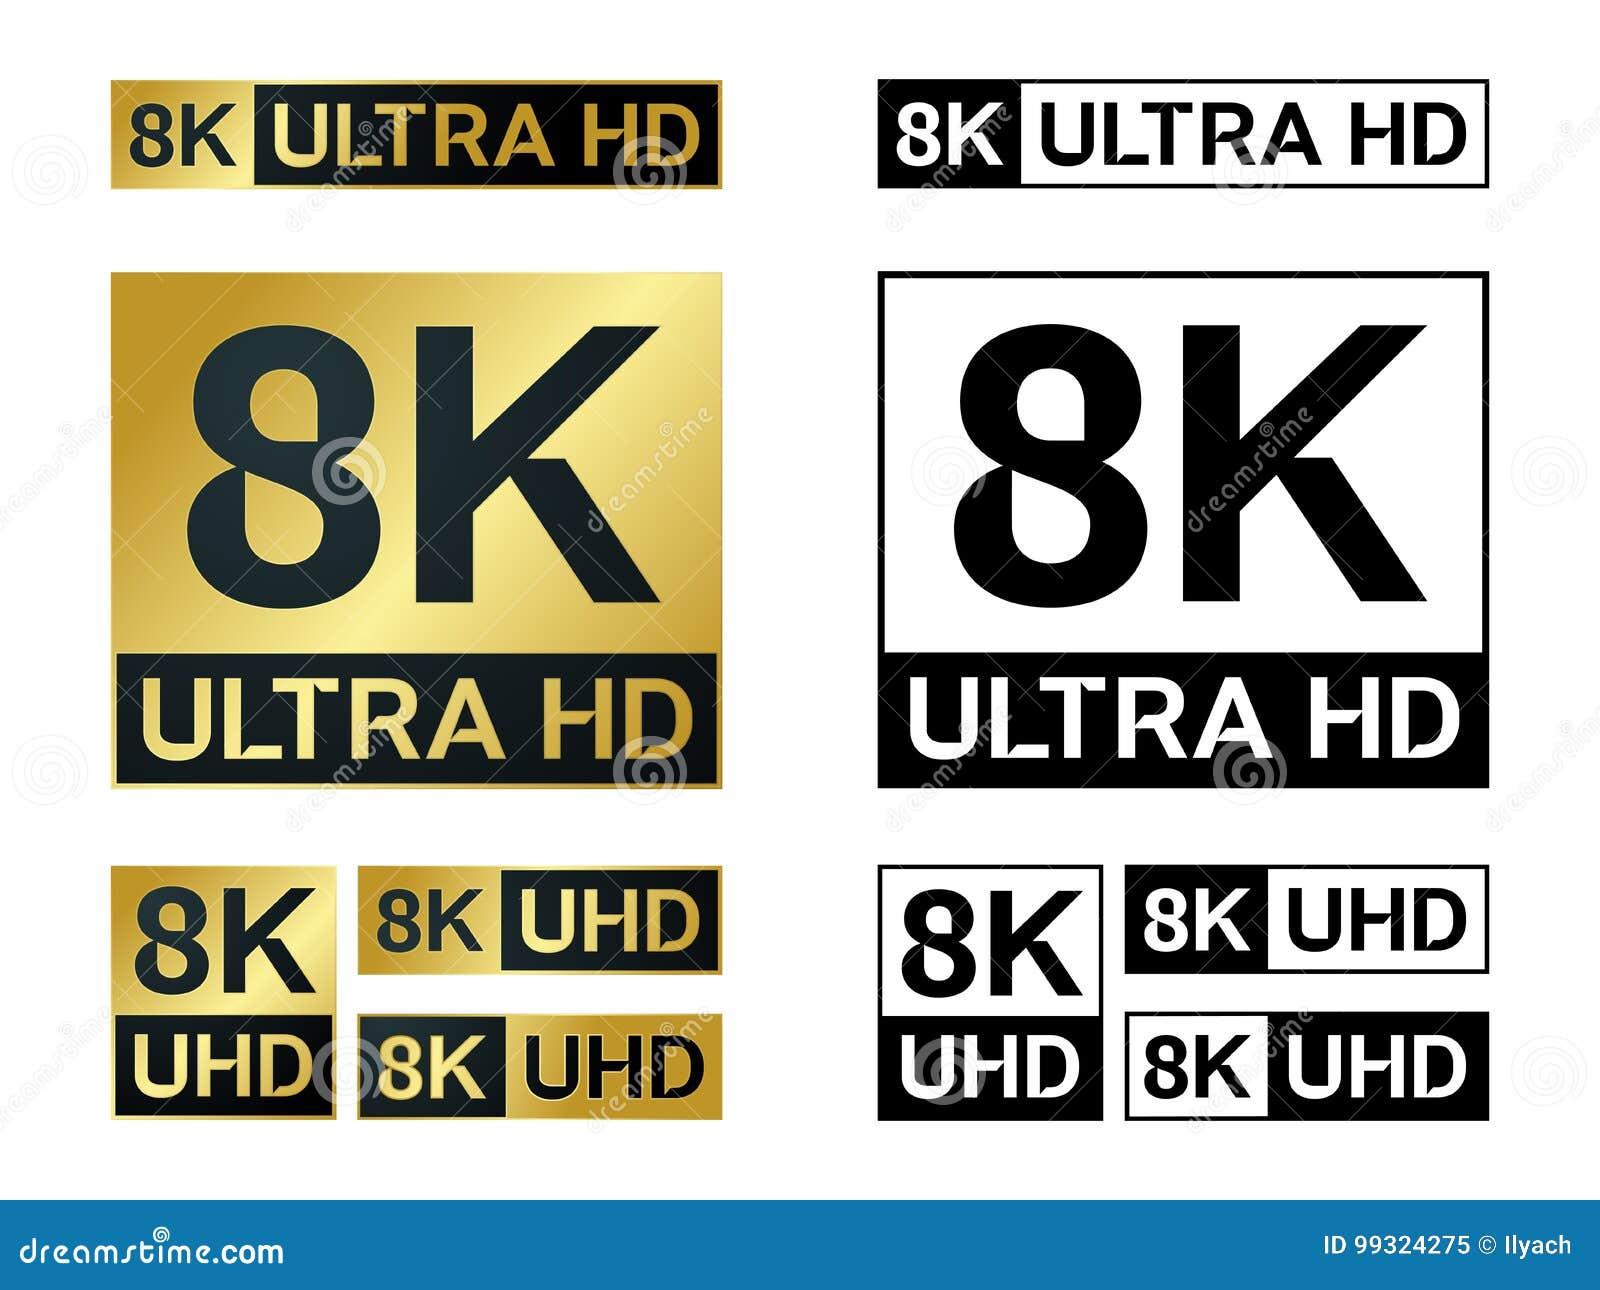 8k Ultra Hd Icon Vector 8k Uhd Tv Symbol Of High Definition Monitor Display Resolution Standard